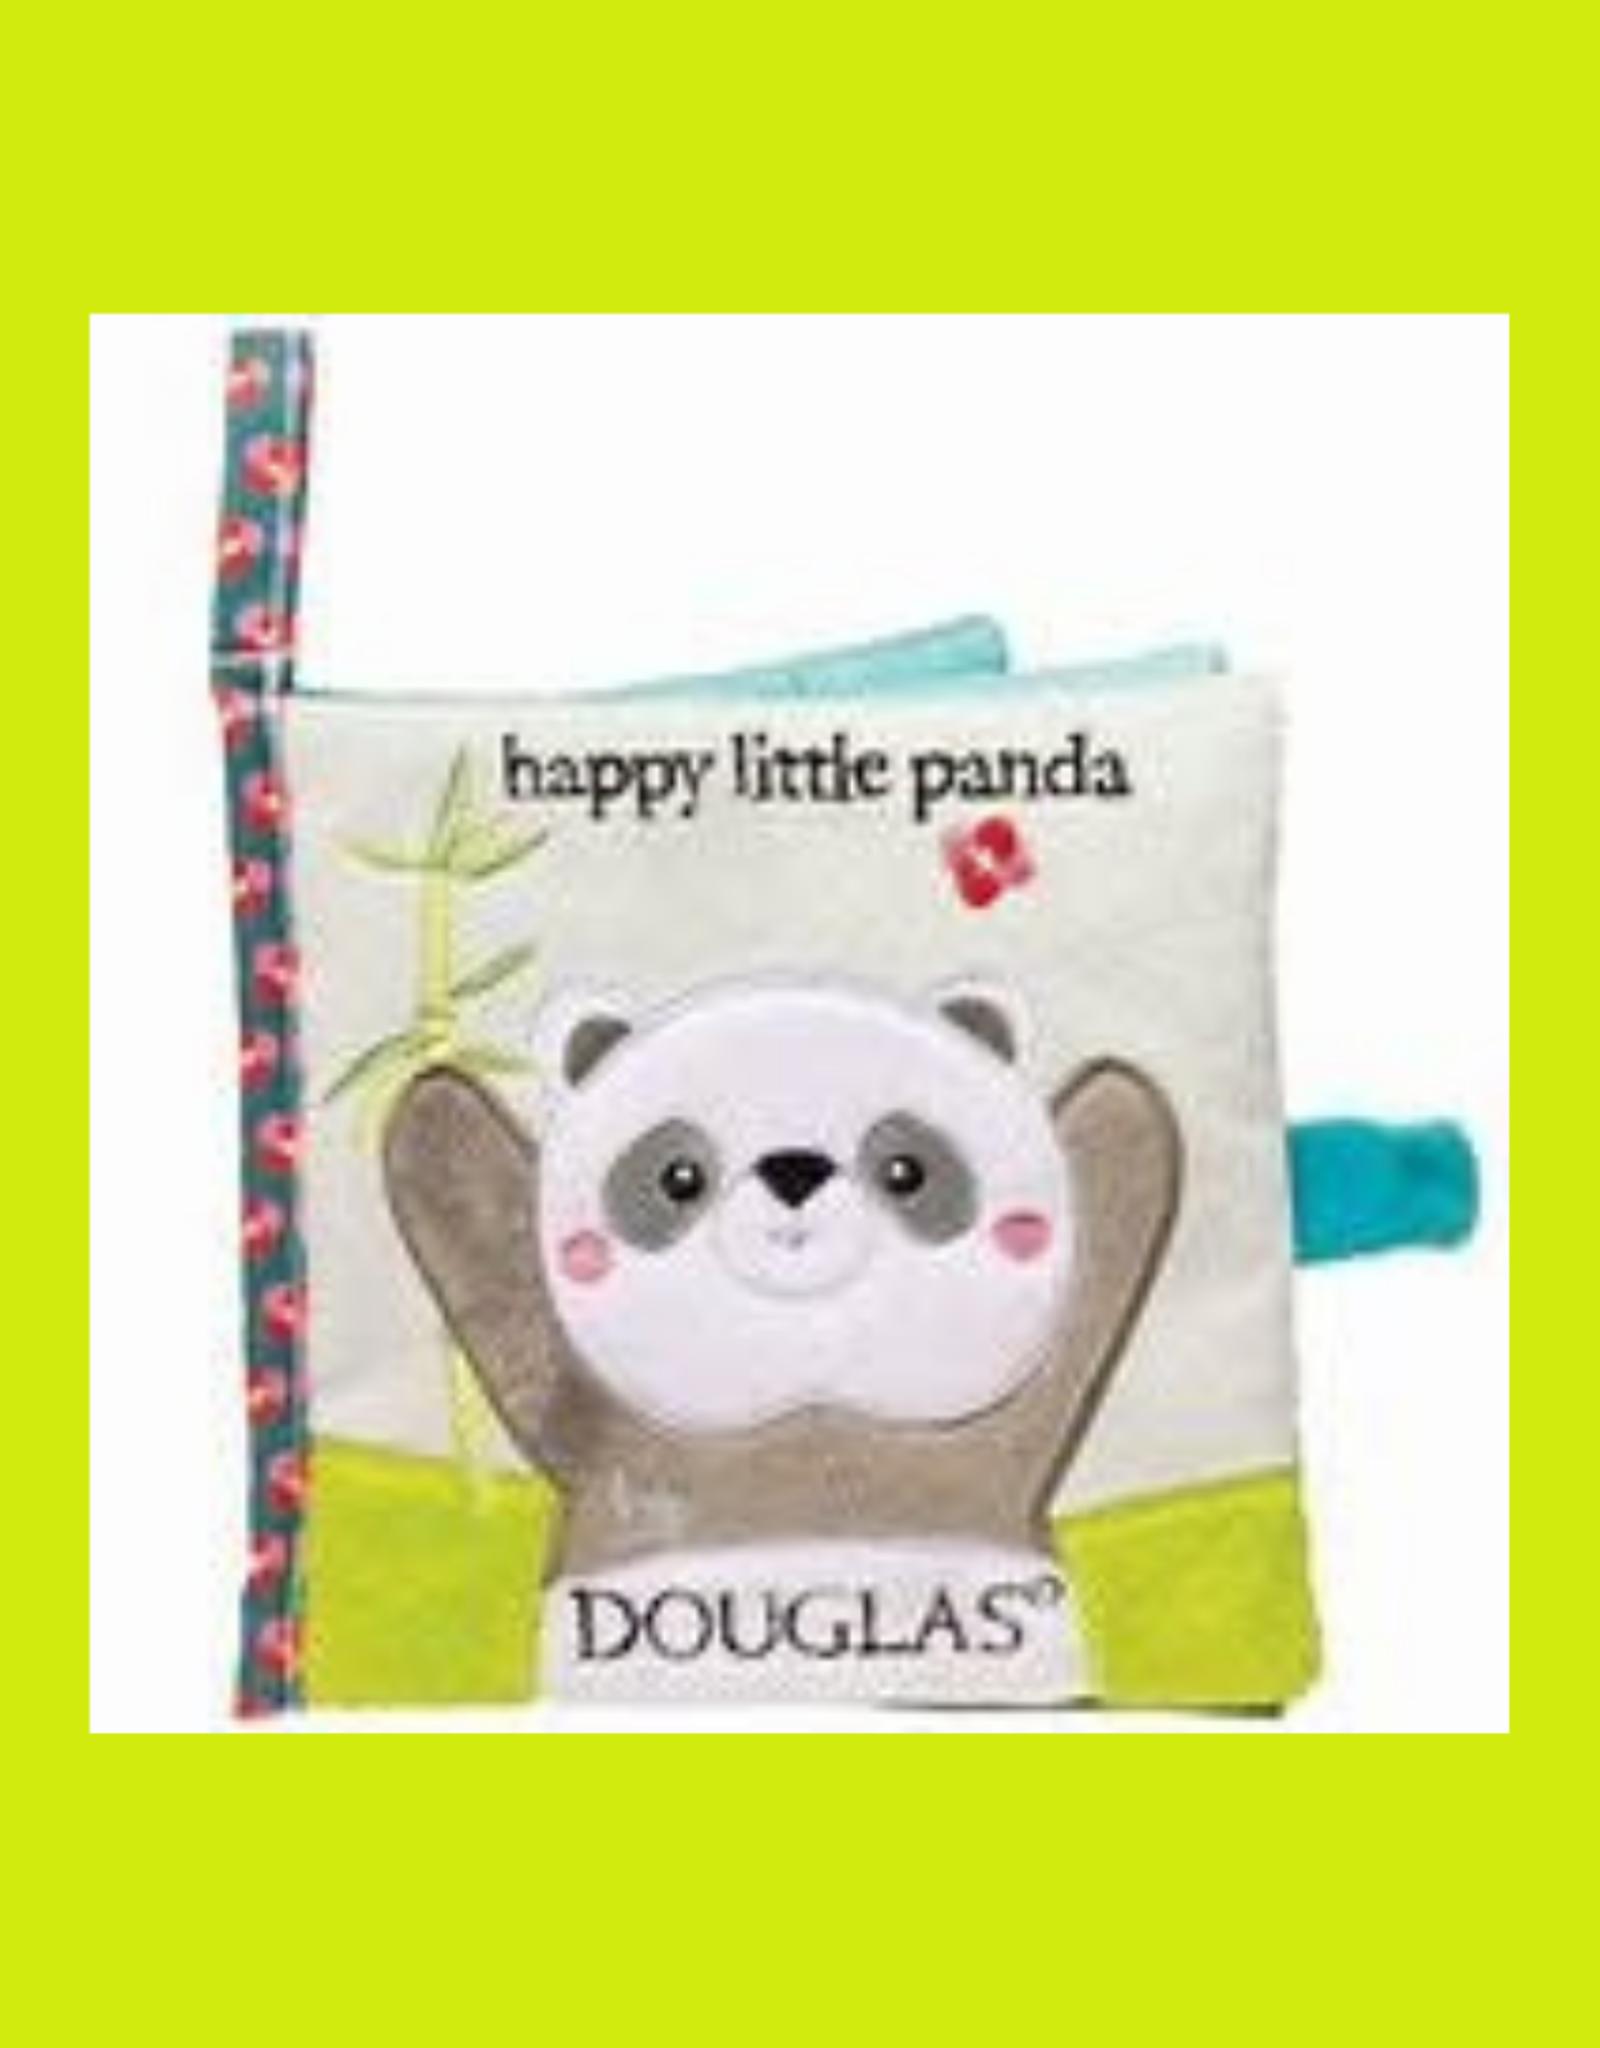 DOUGLAS CUDDLE TOY PANDA ACTIVITY BOOK